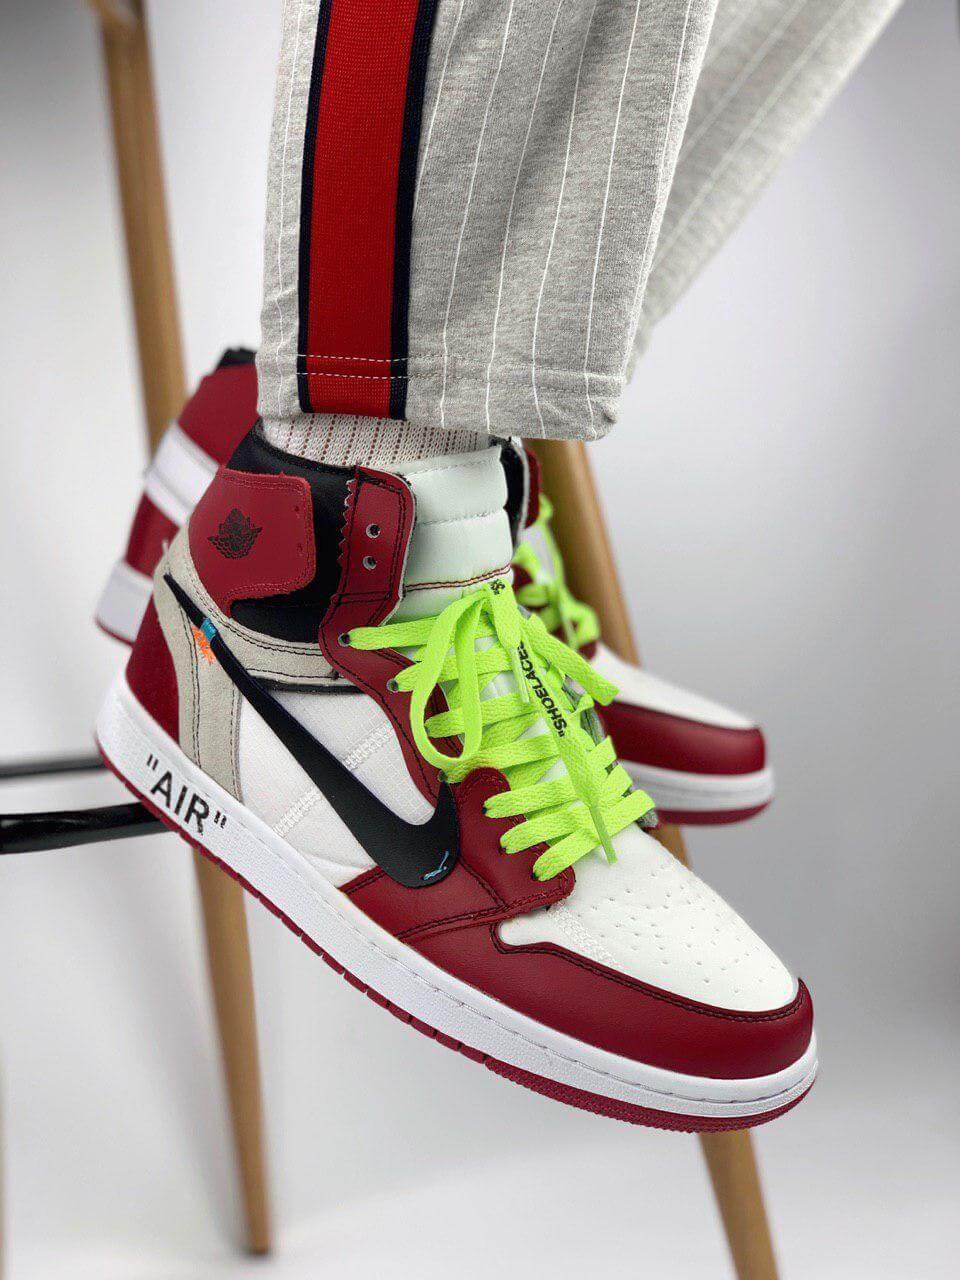 412b7dcd Кроссовки Air Jordan 1 x Off White Chicago - Интернет магазин обуви  «im-РоLLi